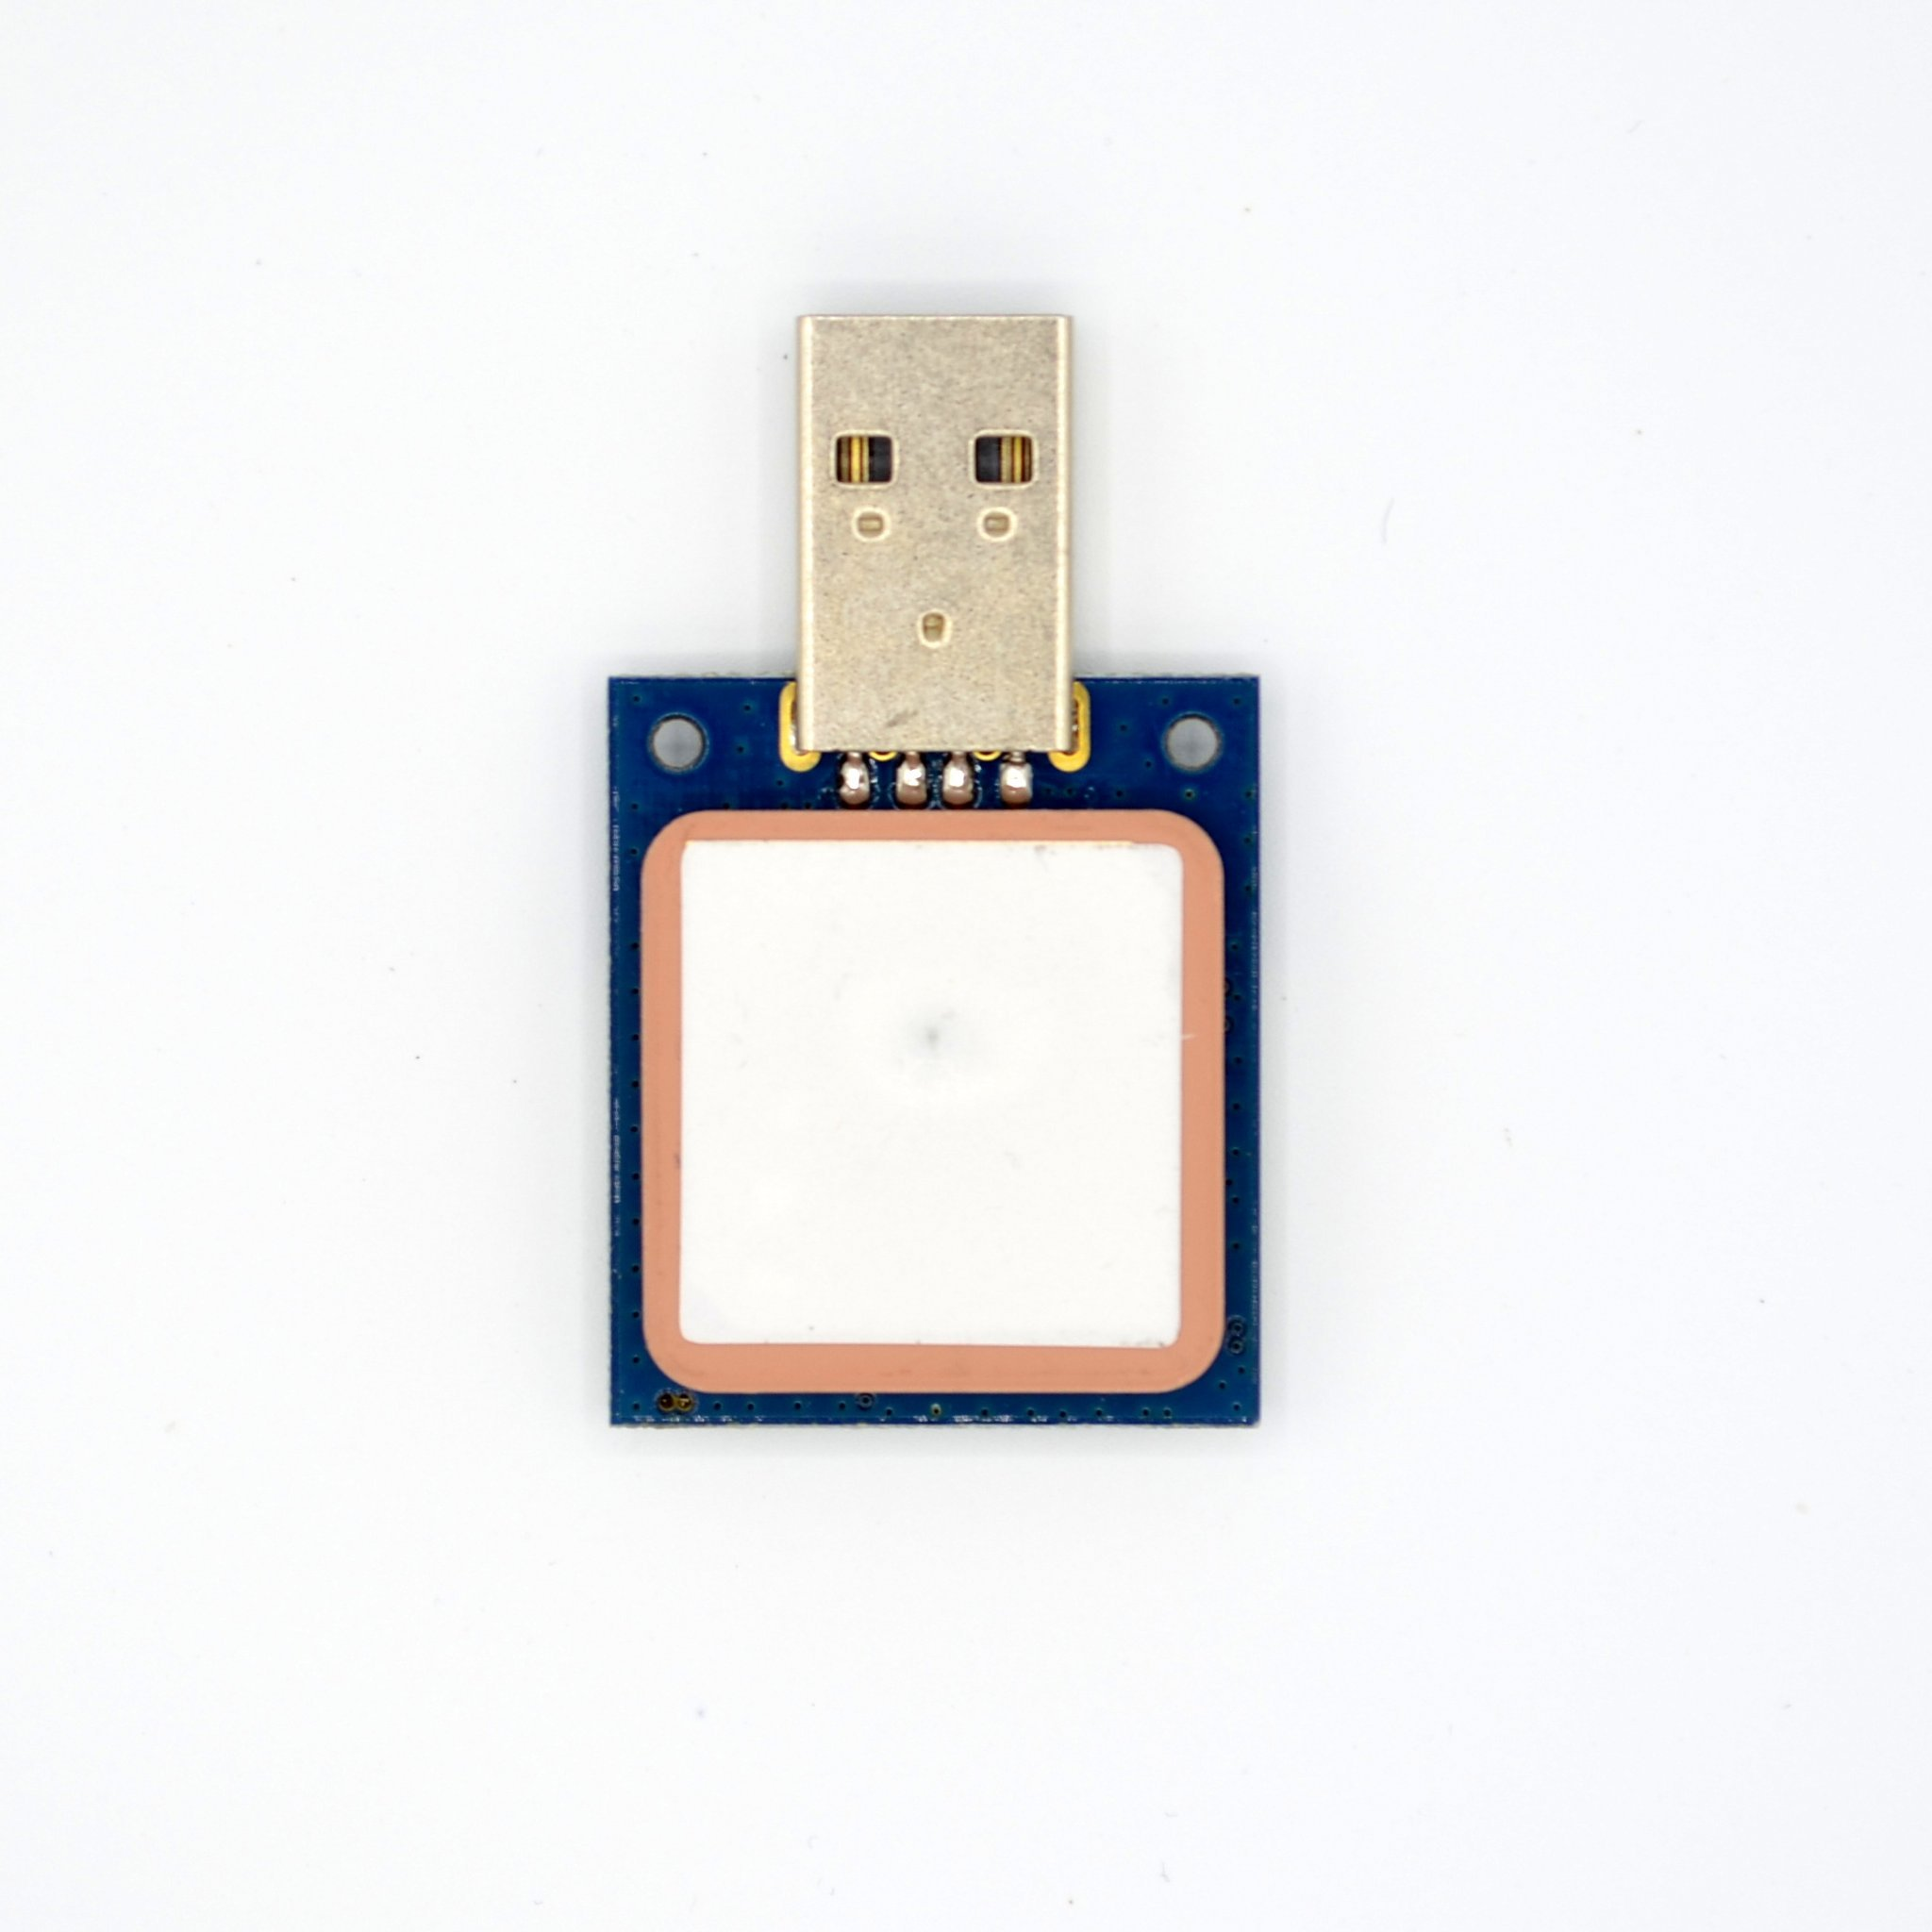 Stratux GPYes u-blox 7 GPS unit